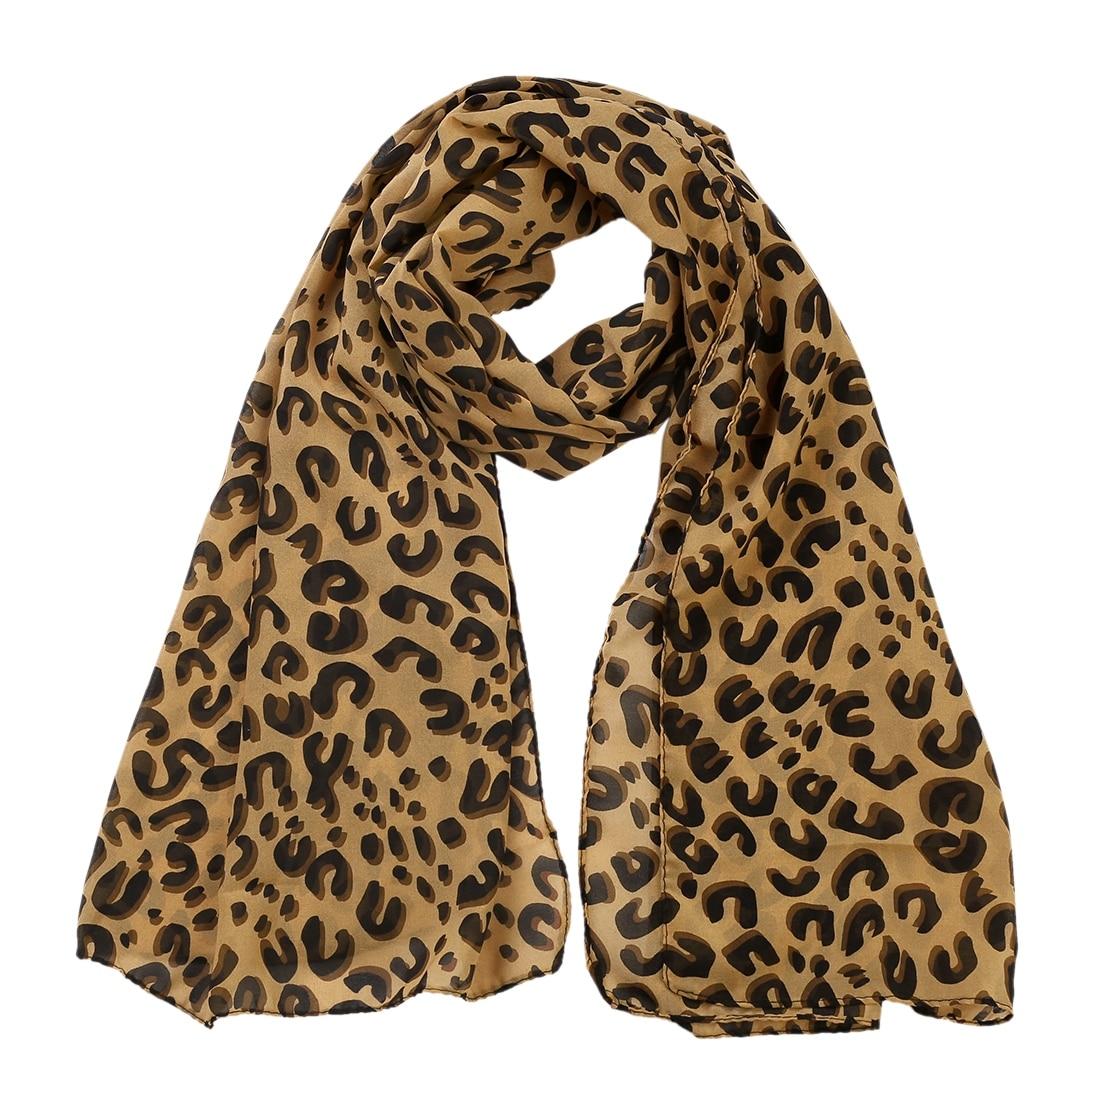 Premium Quality Soft Leopard print Chiffon Scarf NEW